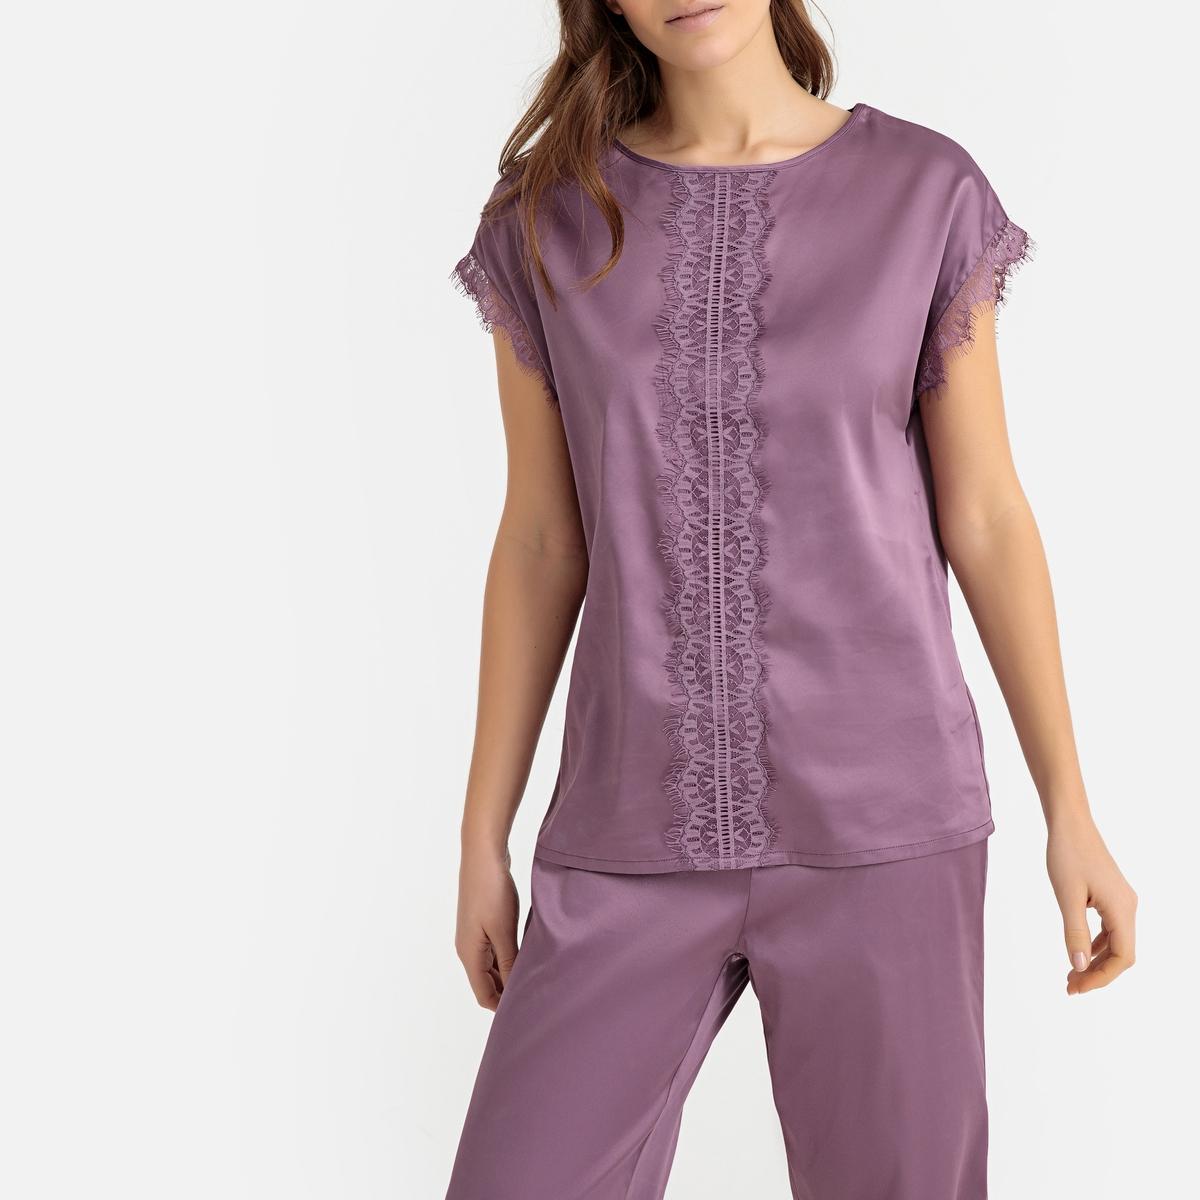 Pijama de satén con detalle de encaje